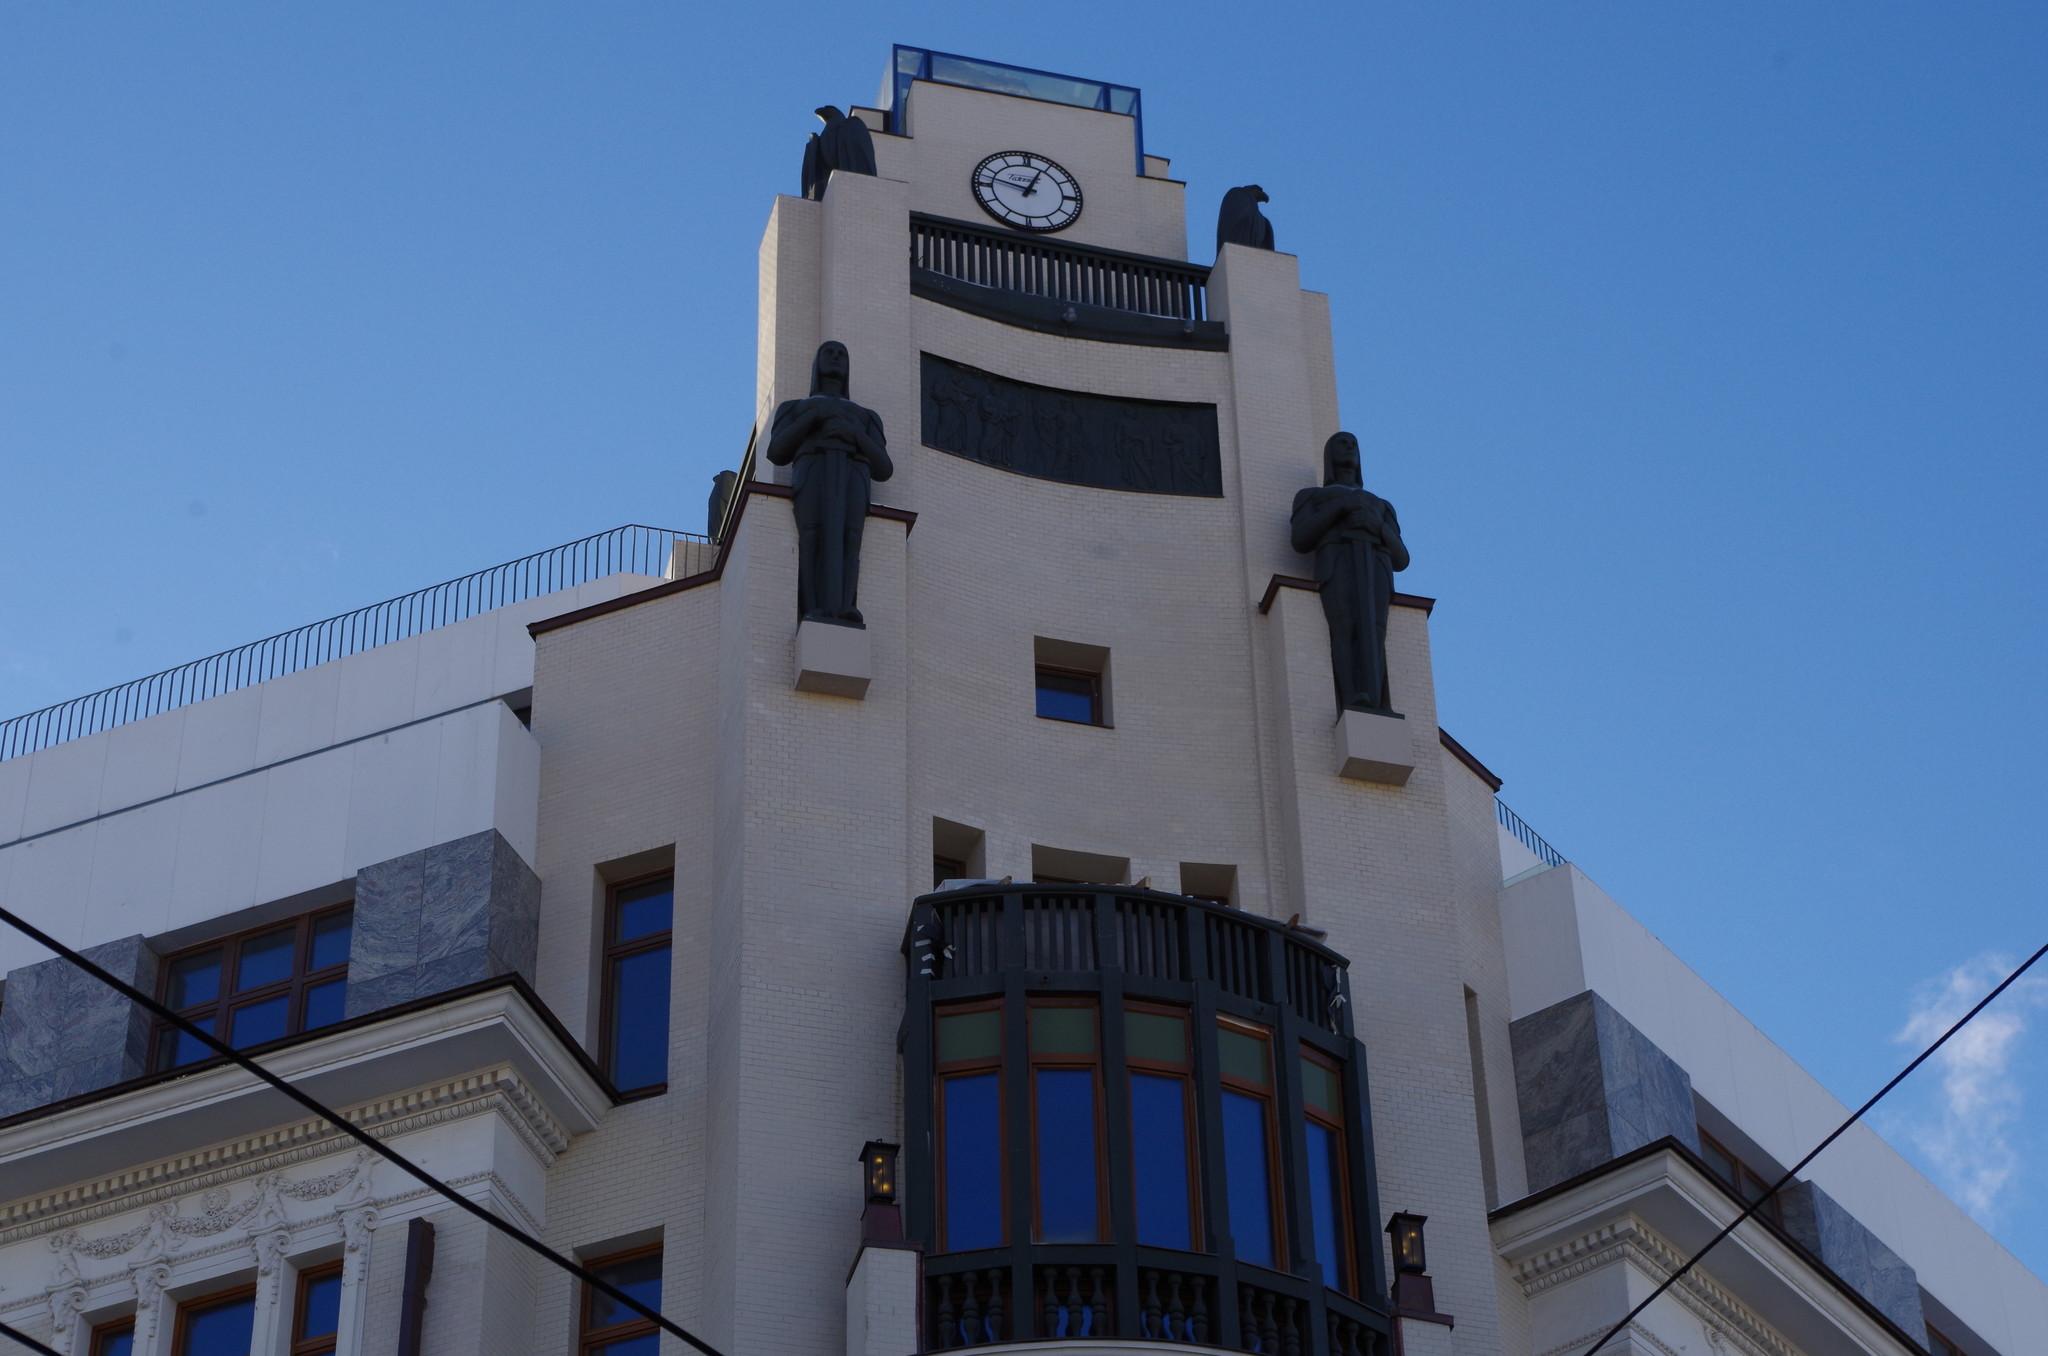 Доходный дом Якова Андреевича Рекка (улица Пречистенка, дом 13)